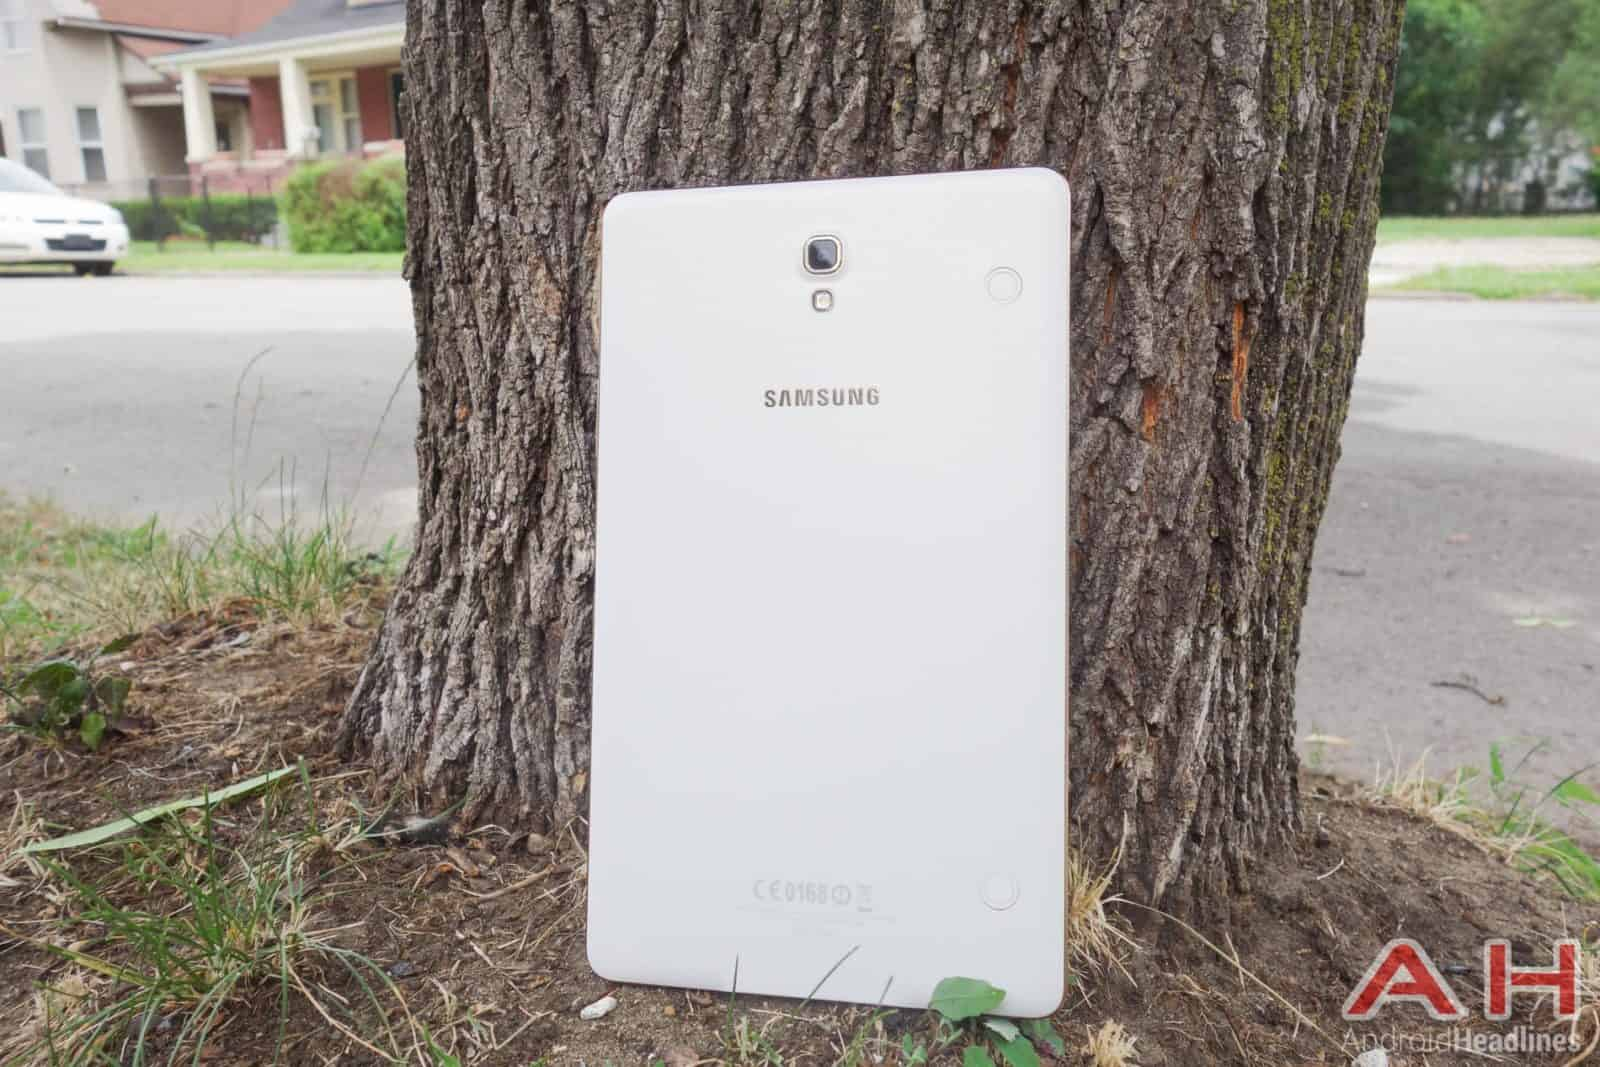 Samsung-Galaxy-Tab-S-Review-AH-1